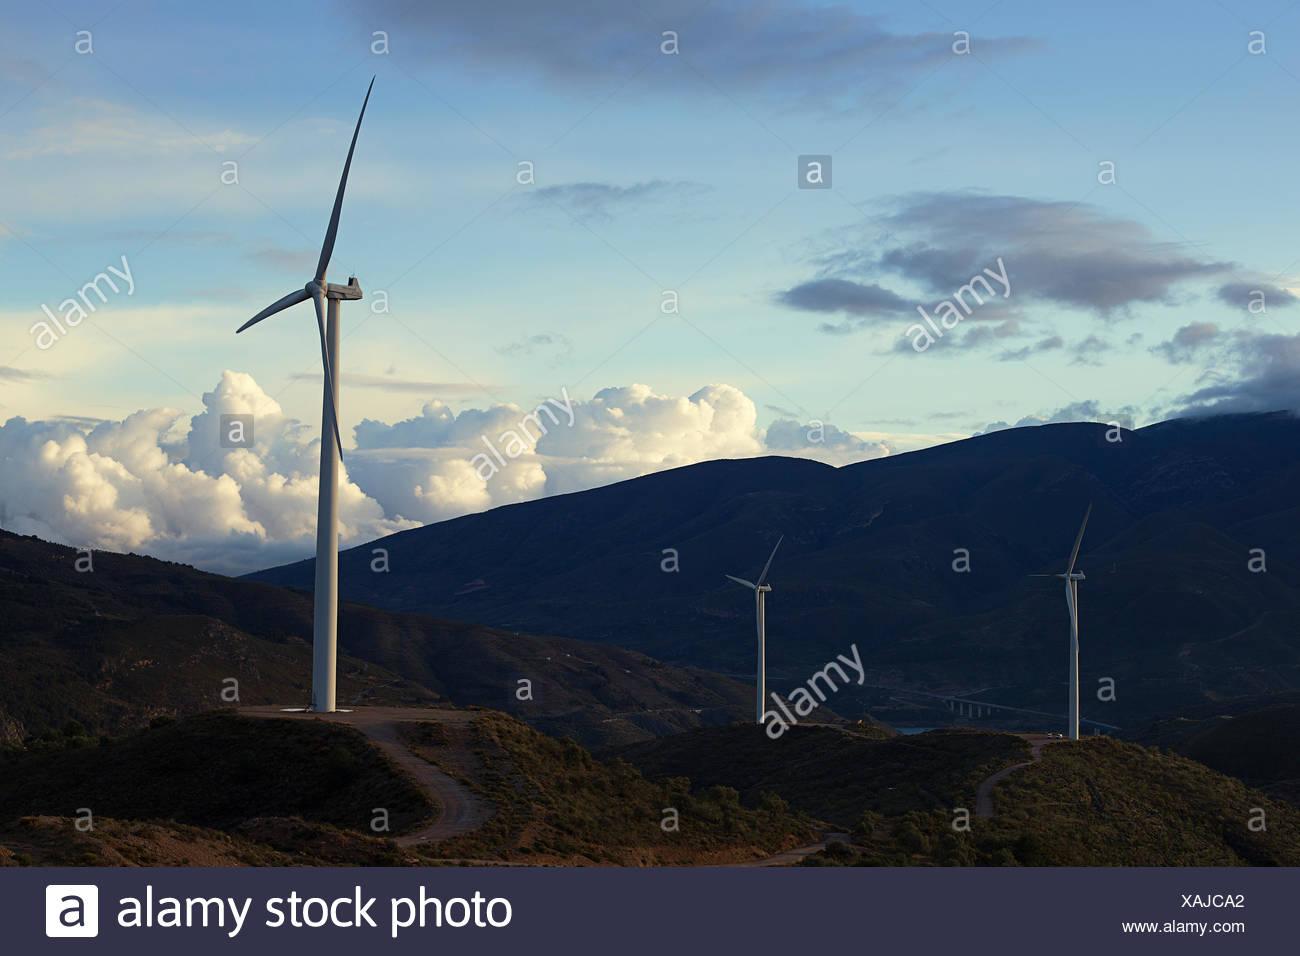 Three wind turbines in rural landscape, Spain - Stock Image